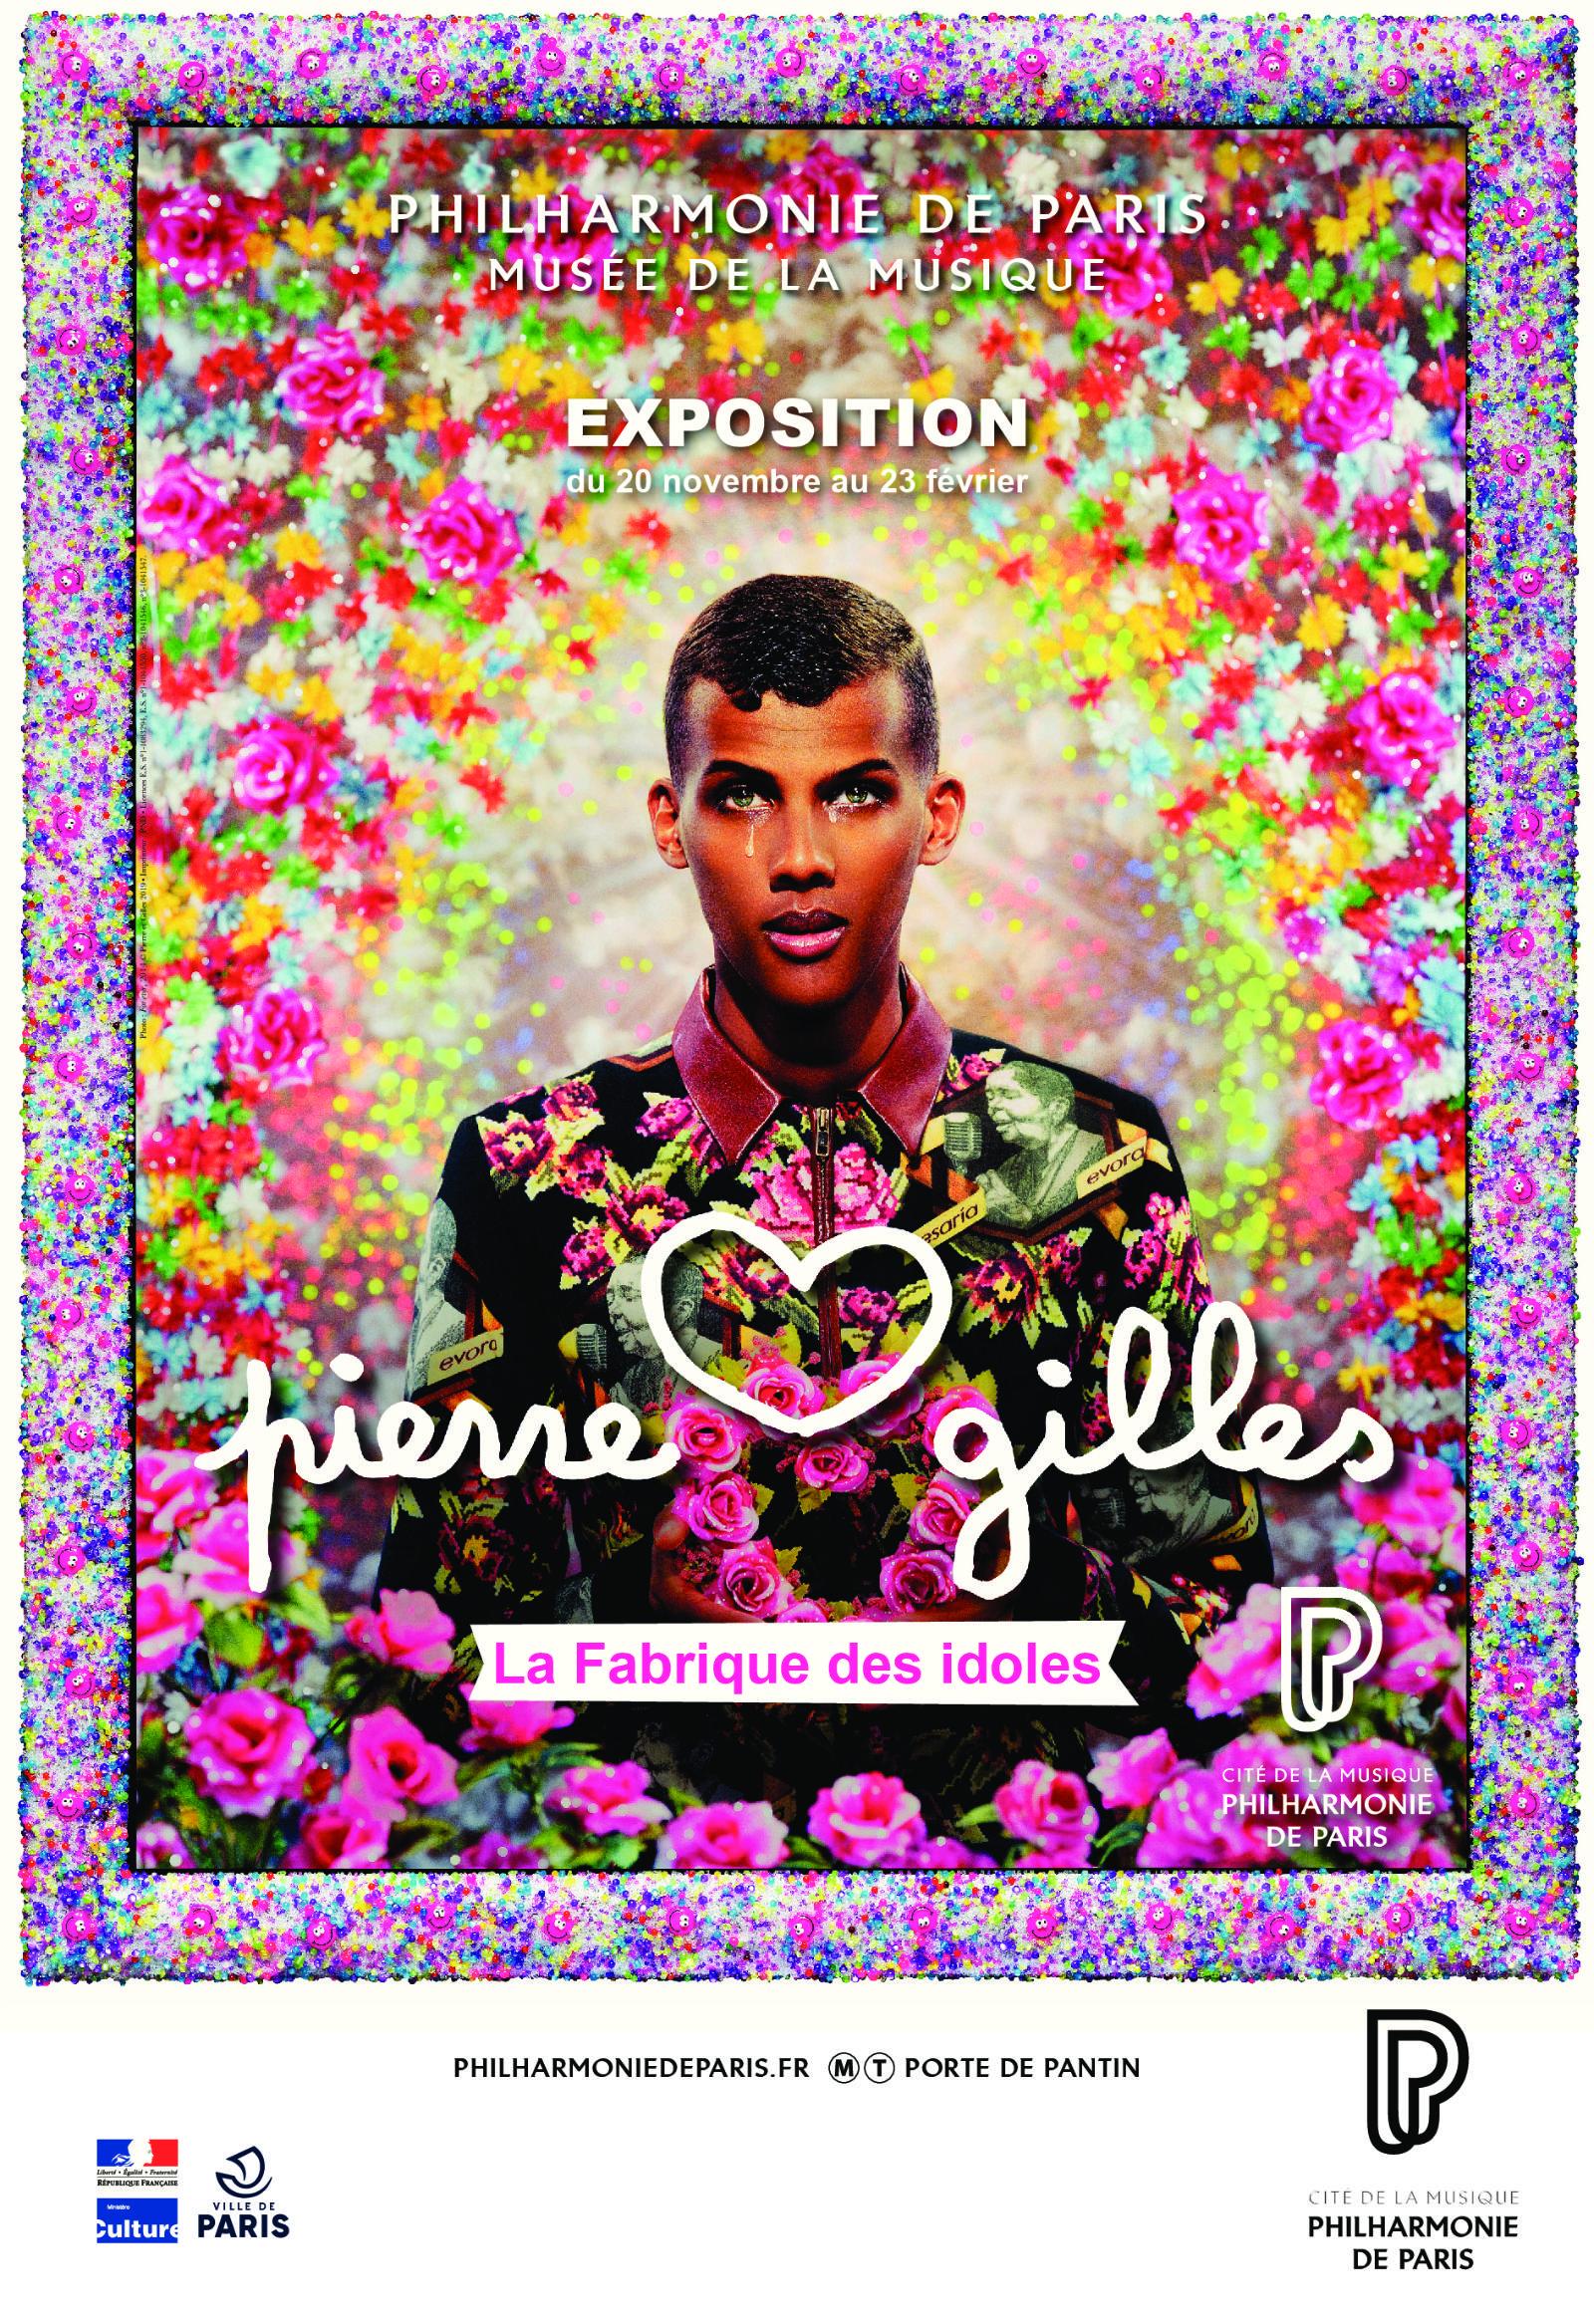 Pierre et Gilles : Factory of Idols